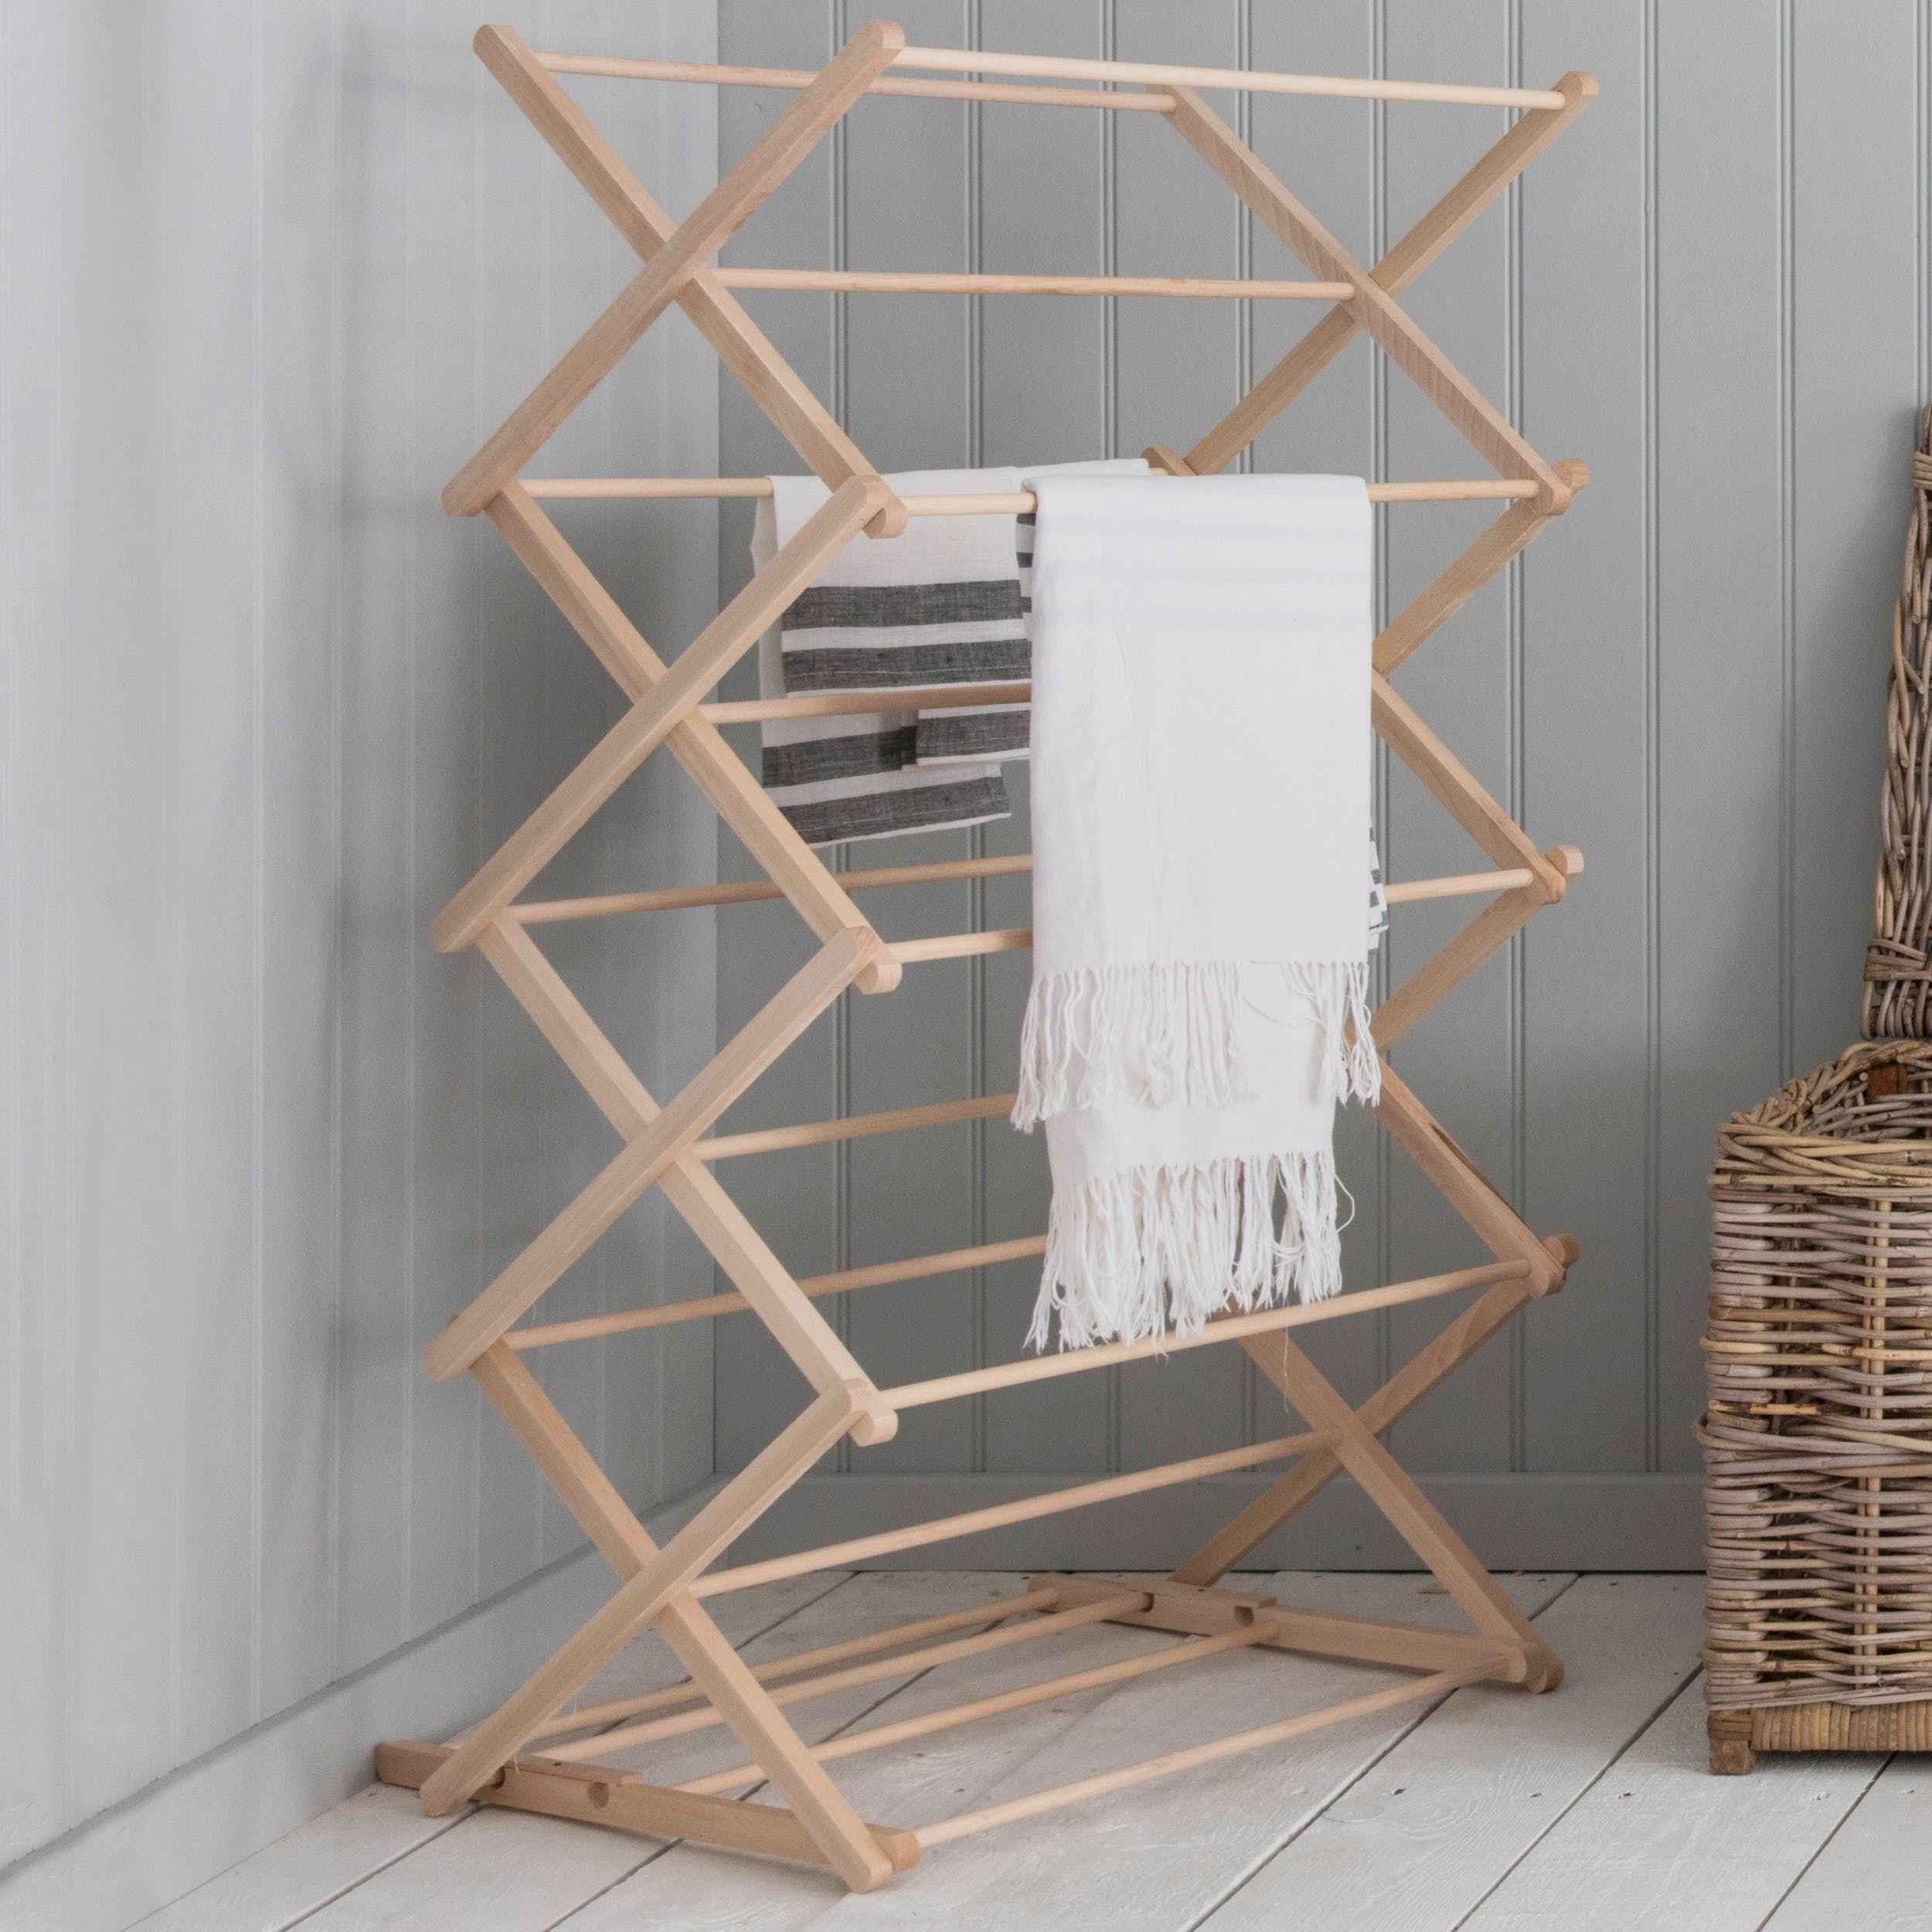 ZigZag Trading Ltd IKEA MALINDA Chair